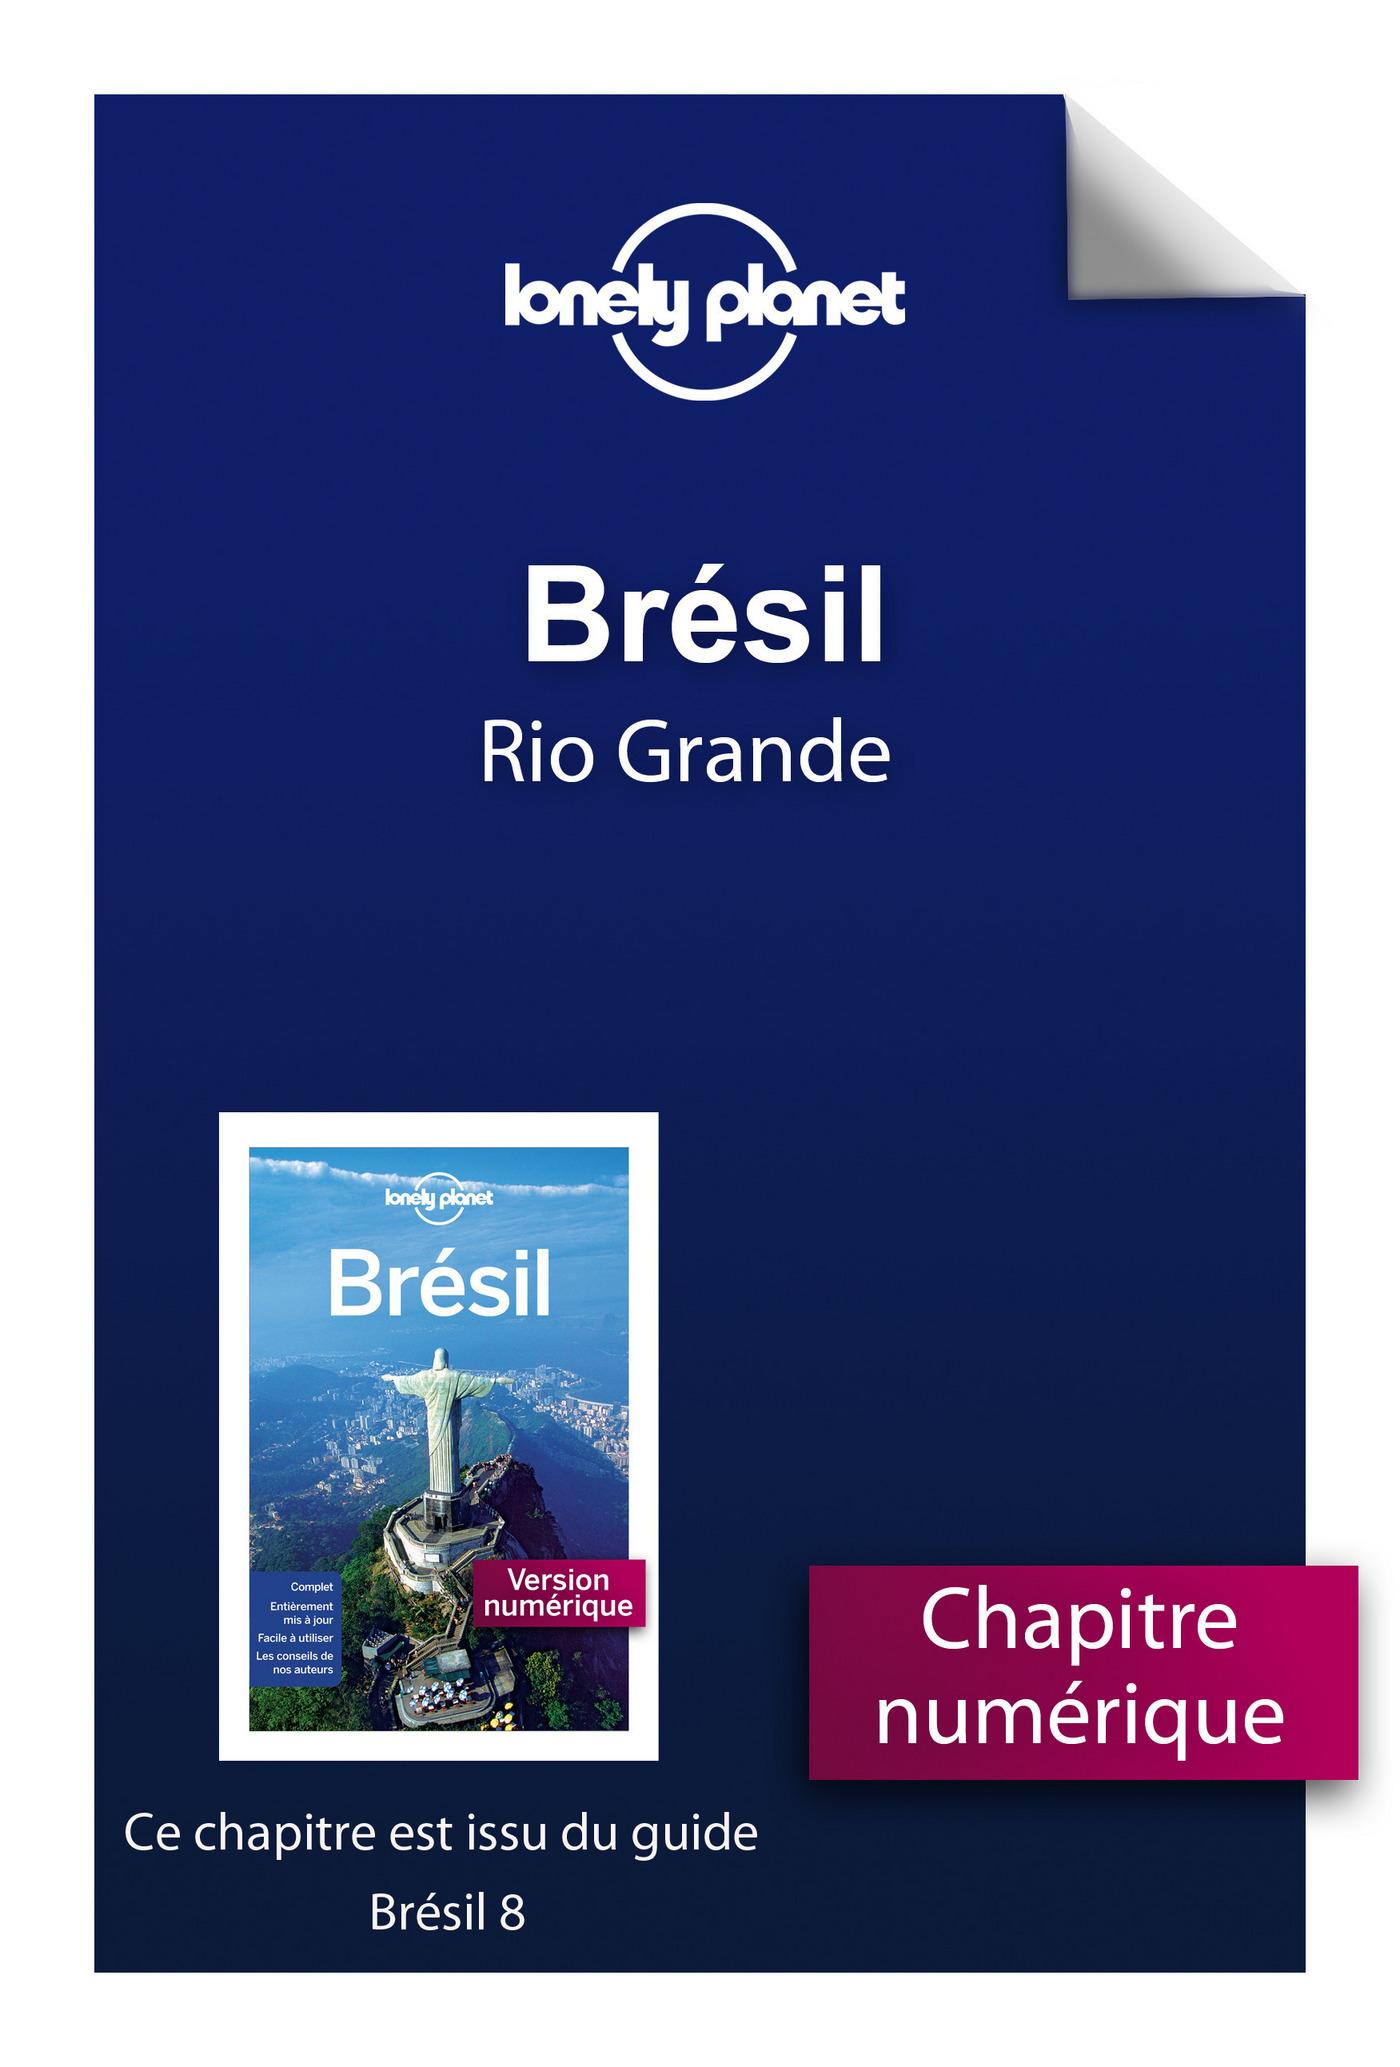 Brésil 8 - Rio Grande